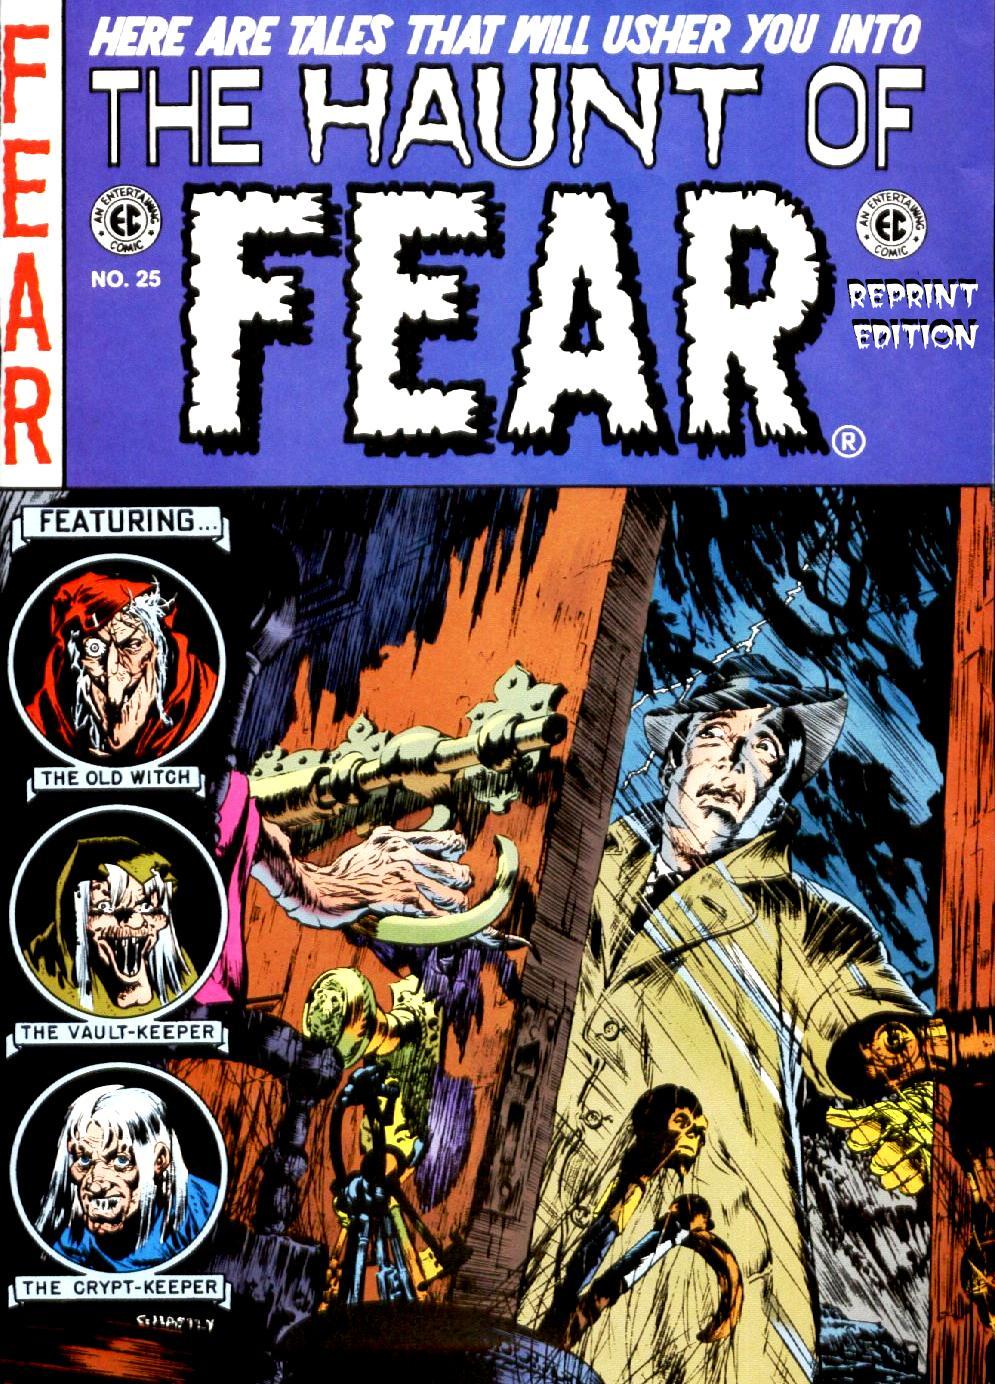 Haunt of Fear 25